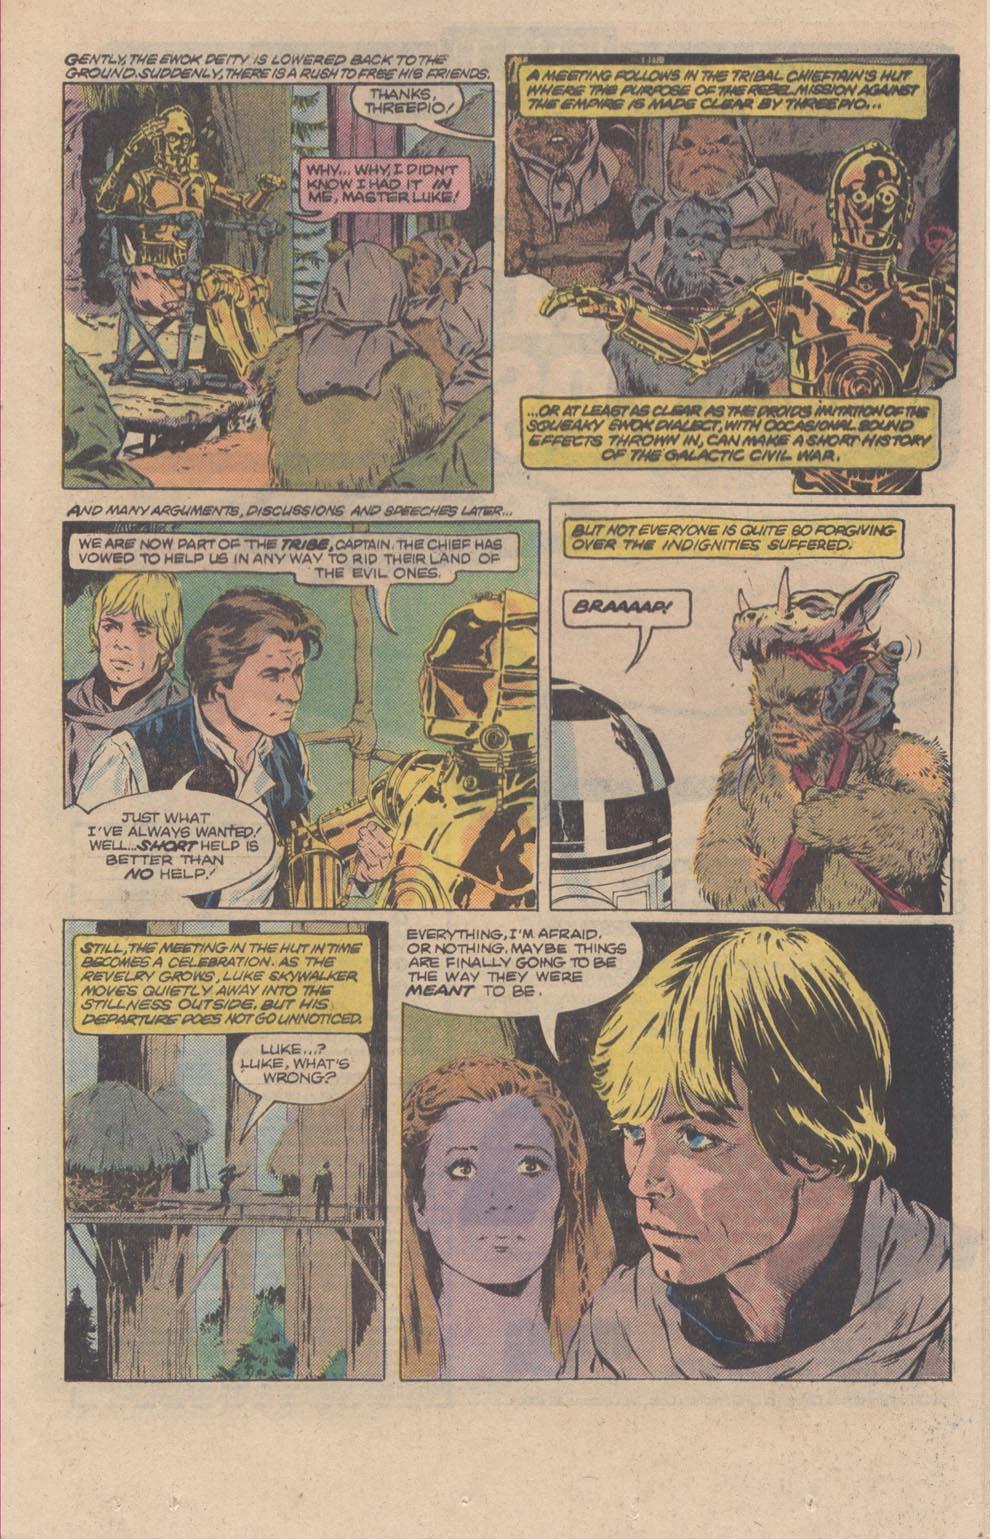 Read online Star Wars: Return of the Jedi comic -  Issue #3 - 17